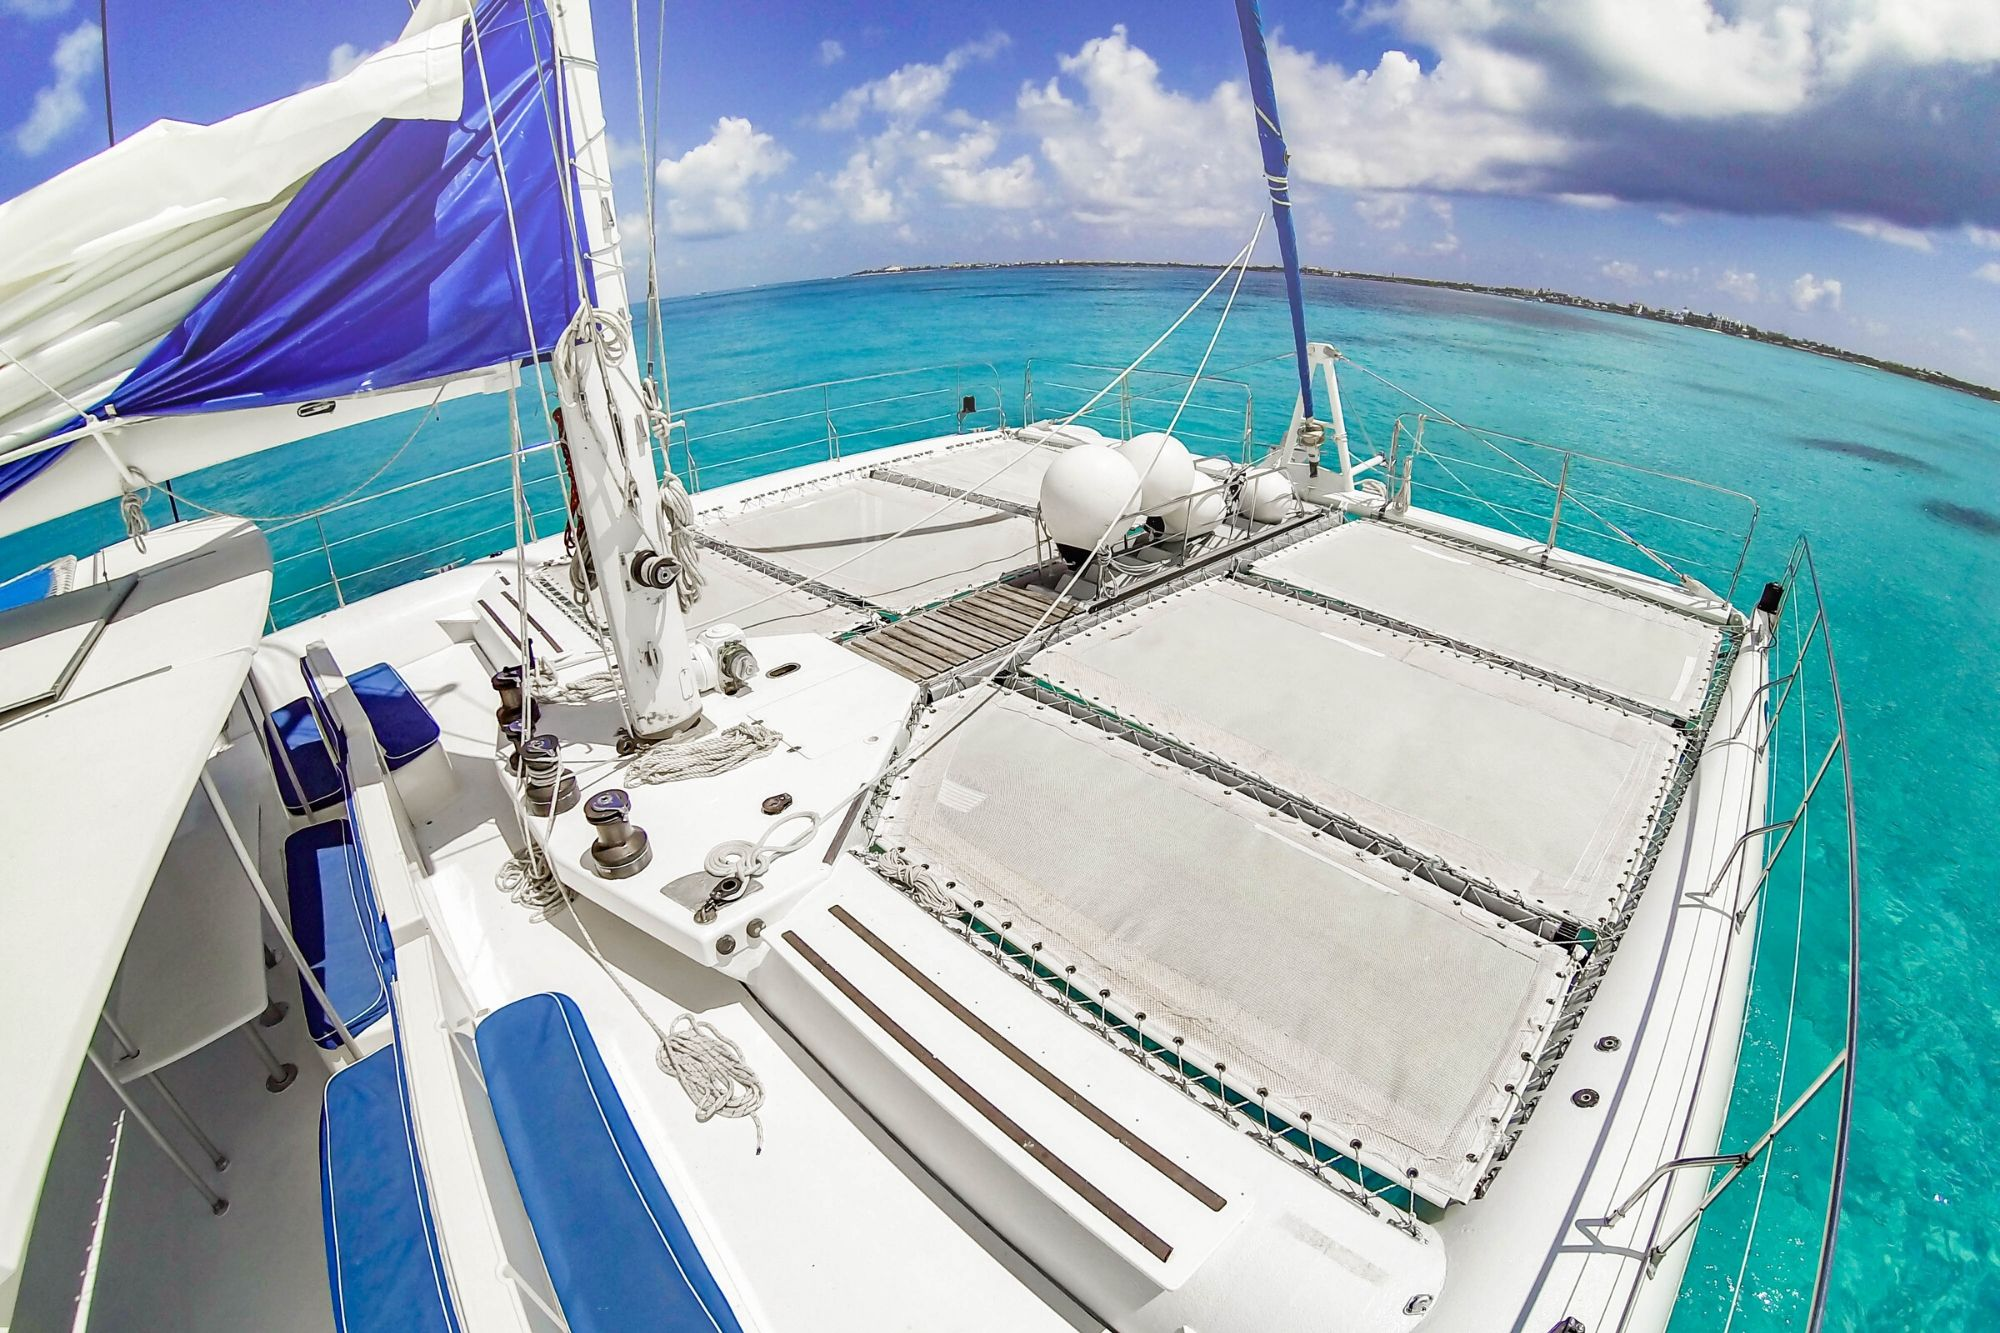 8 Private Isla Mujeres tour in catamaran - Sea Passion I II - Cancun Sailing